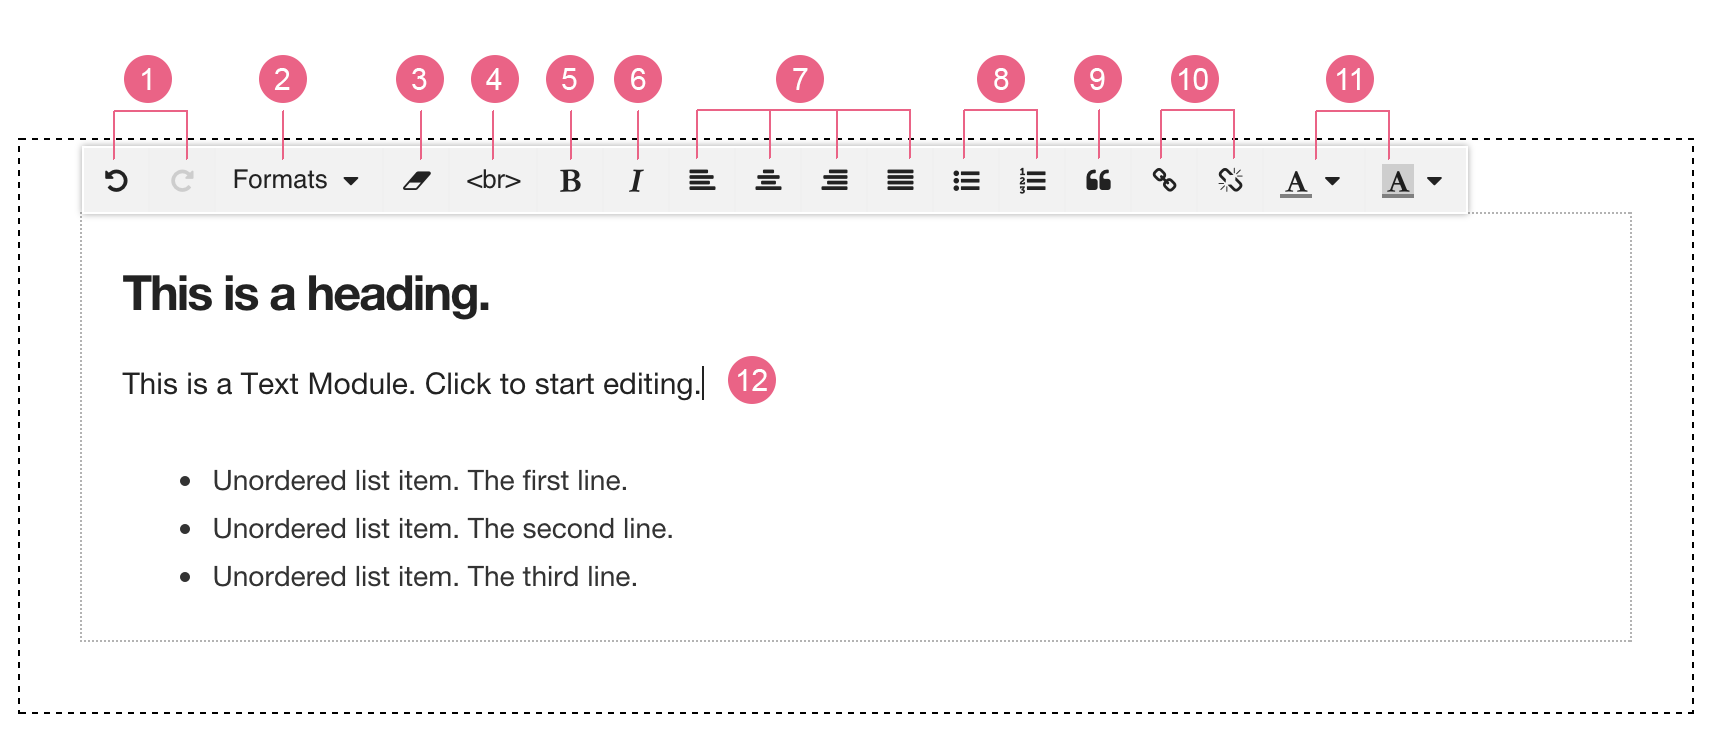 text-module-editing-tools-2